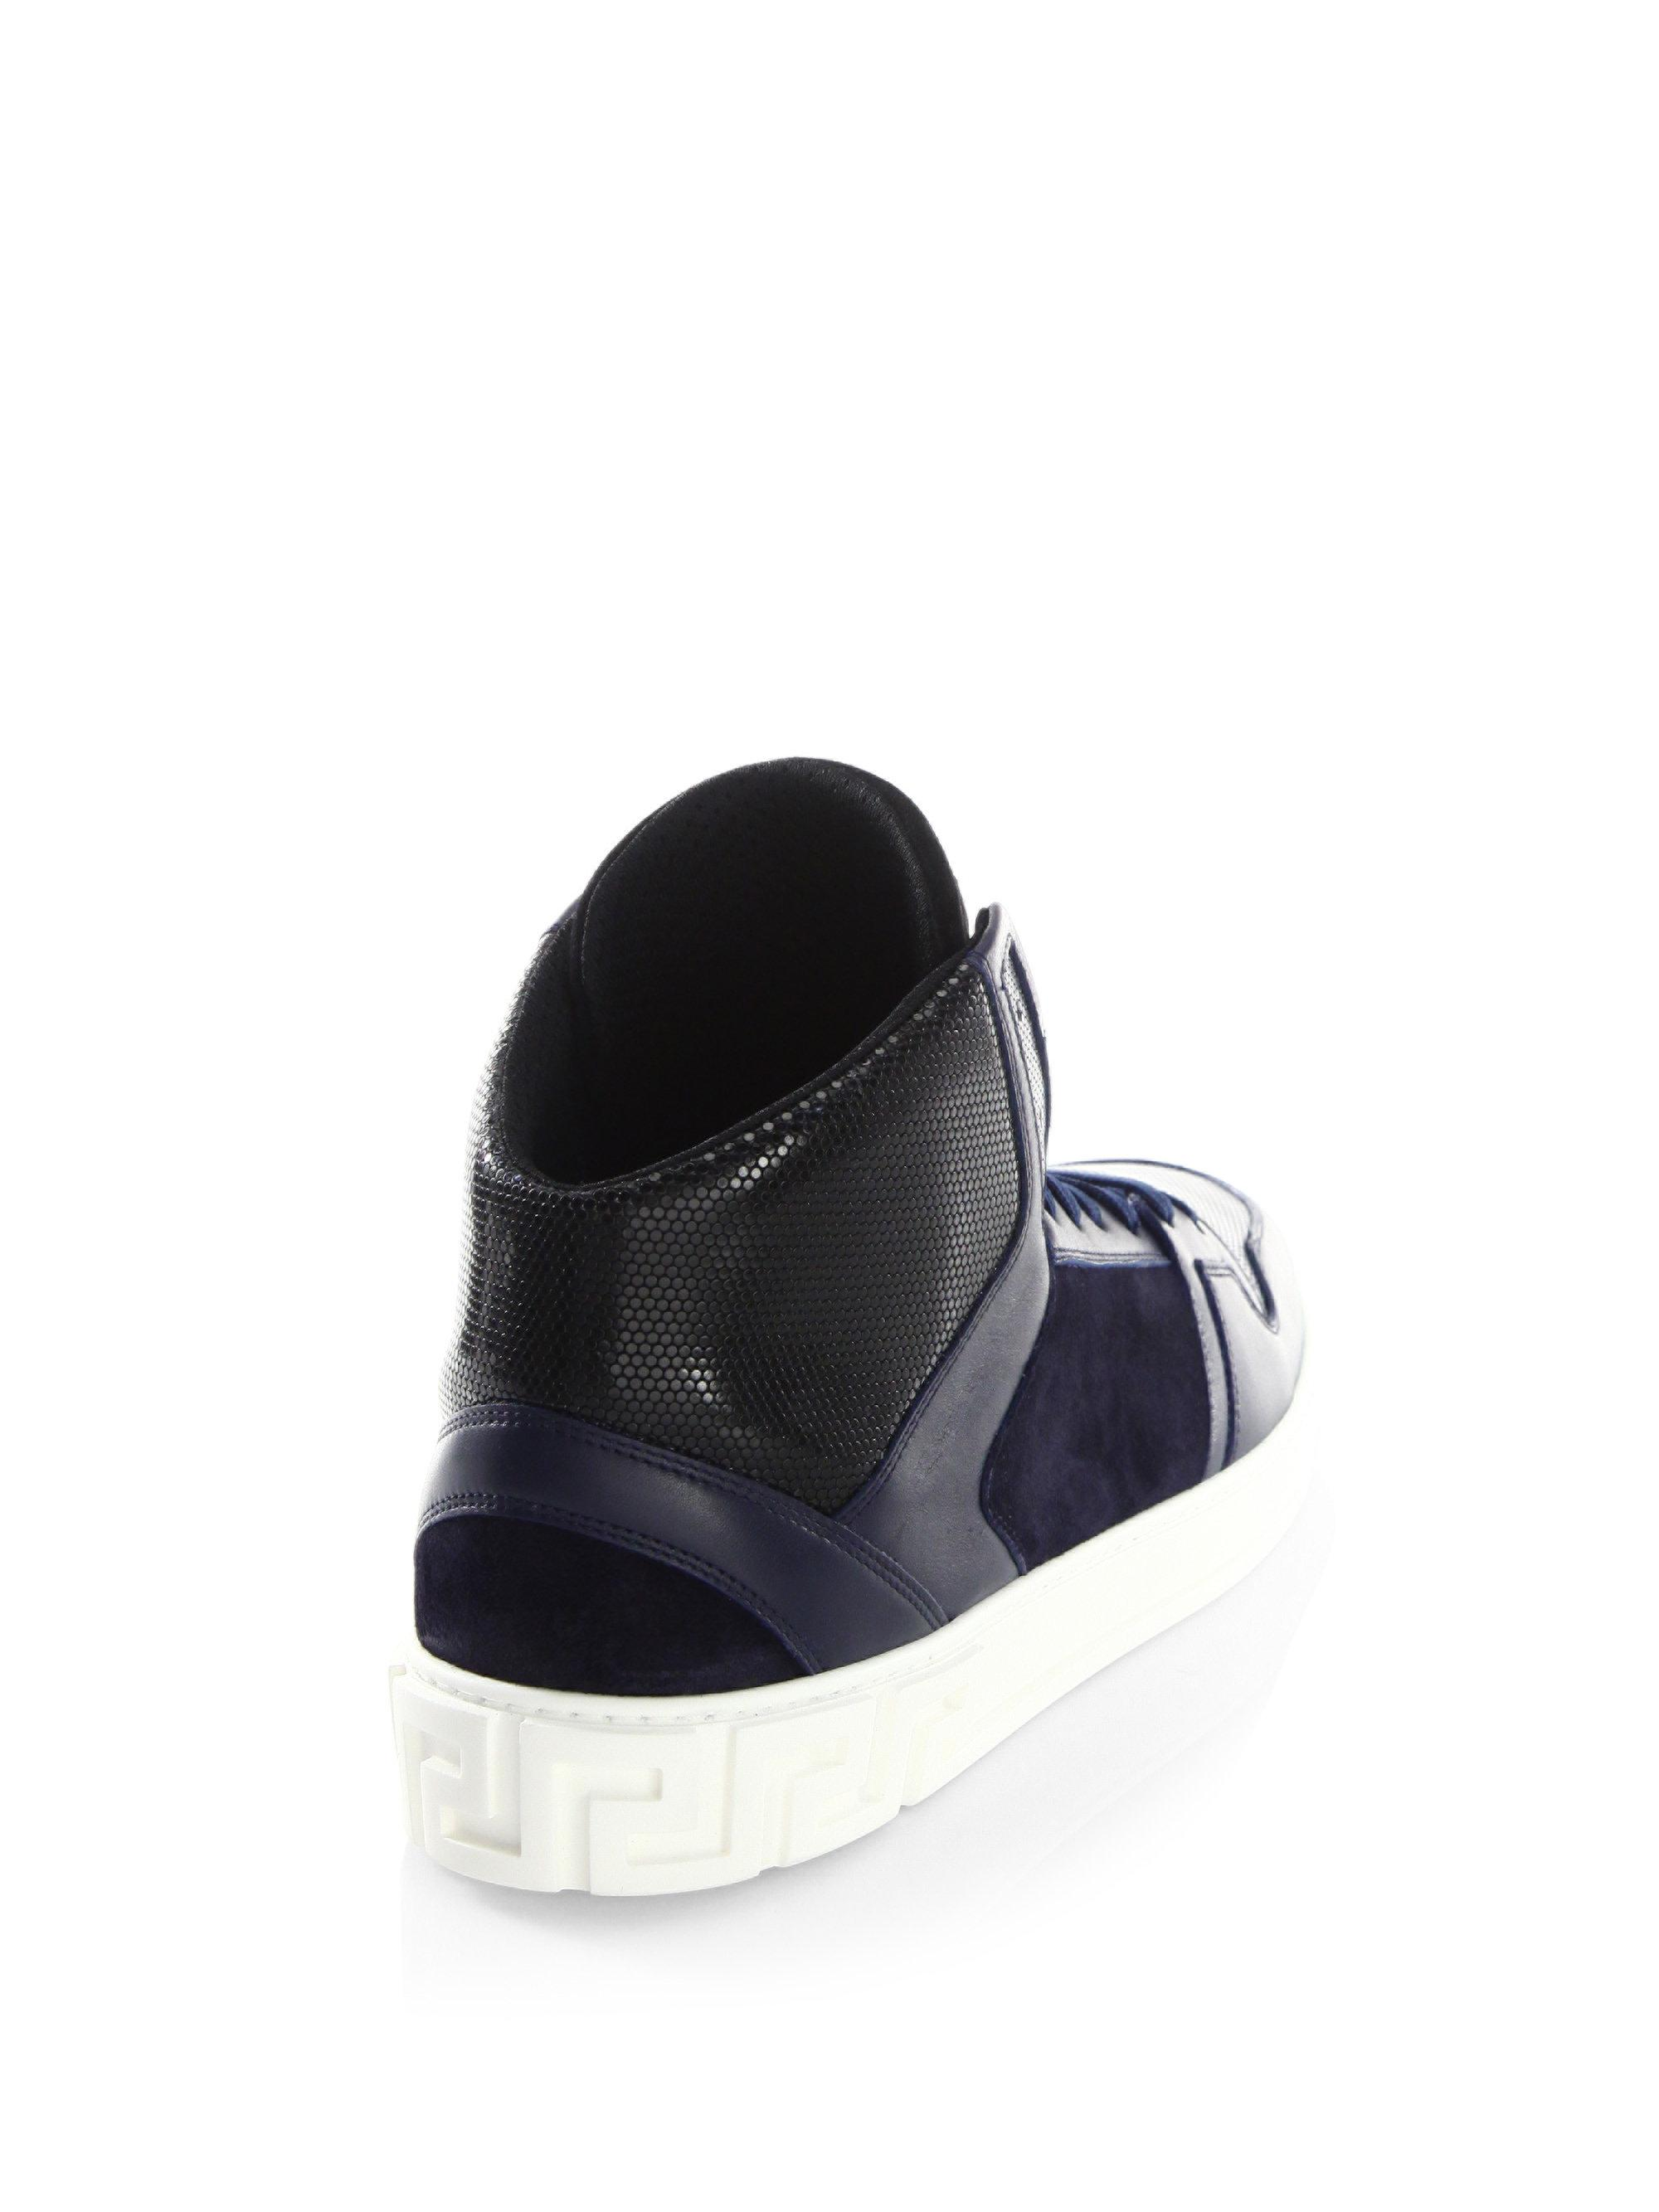 VERSACE Stylish High-Top Sneakers 1IUhaCu